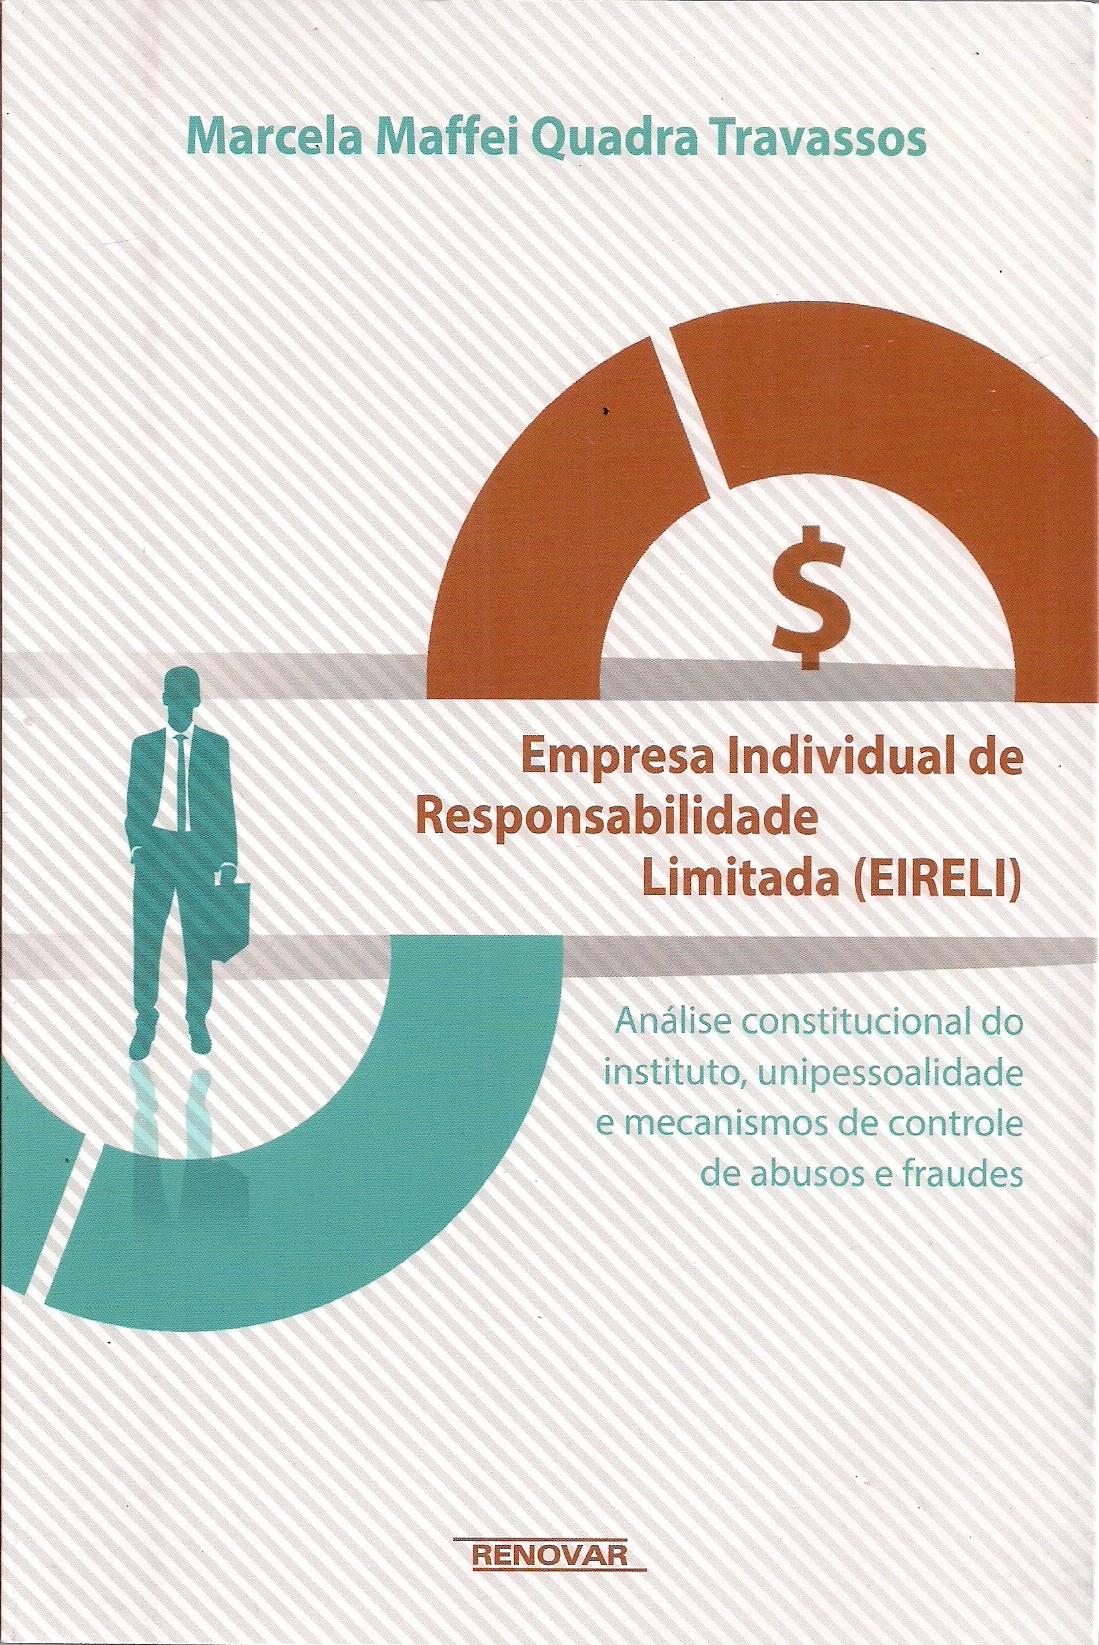 Foto 1 - Empresa Individual de Responsabilidade Limitada